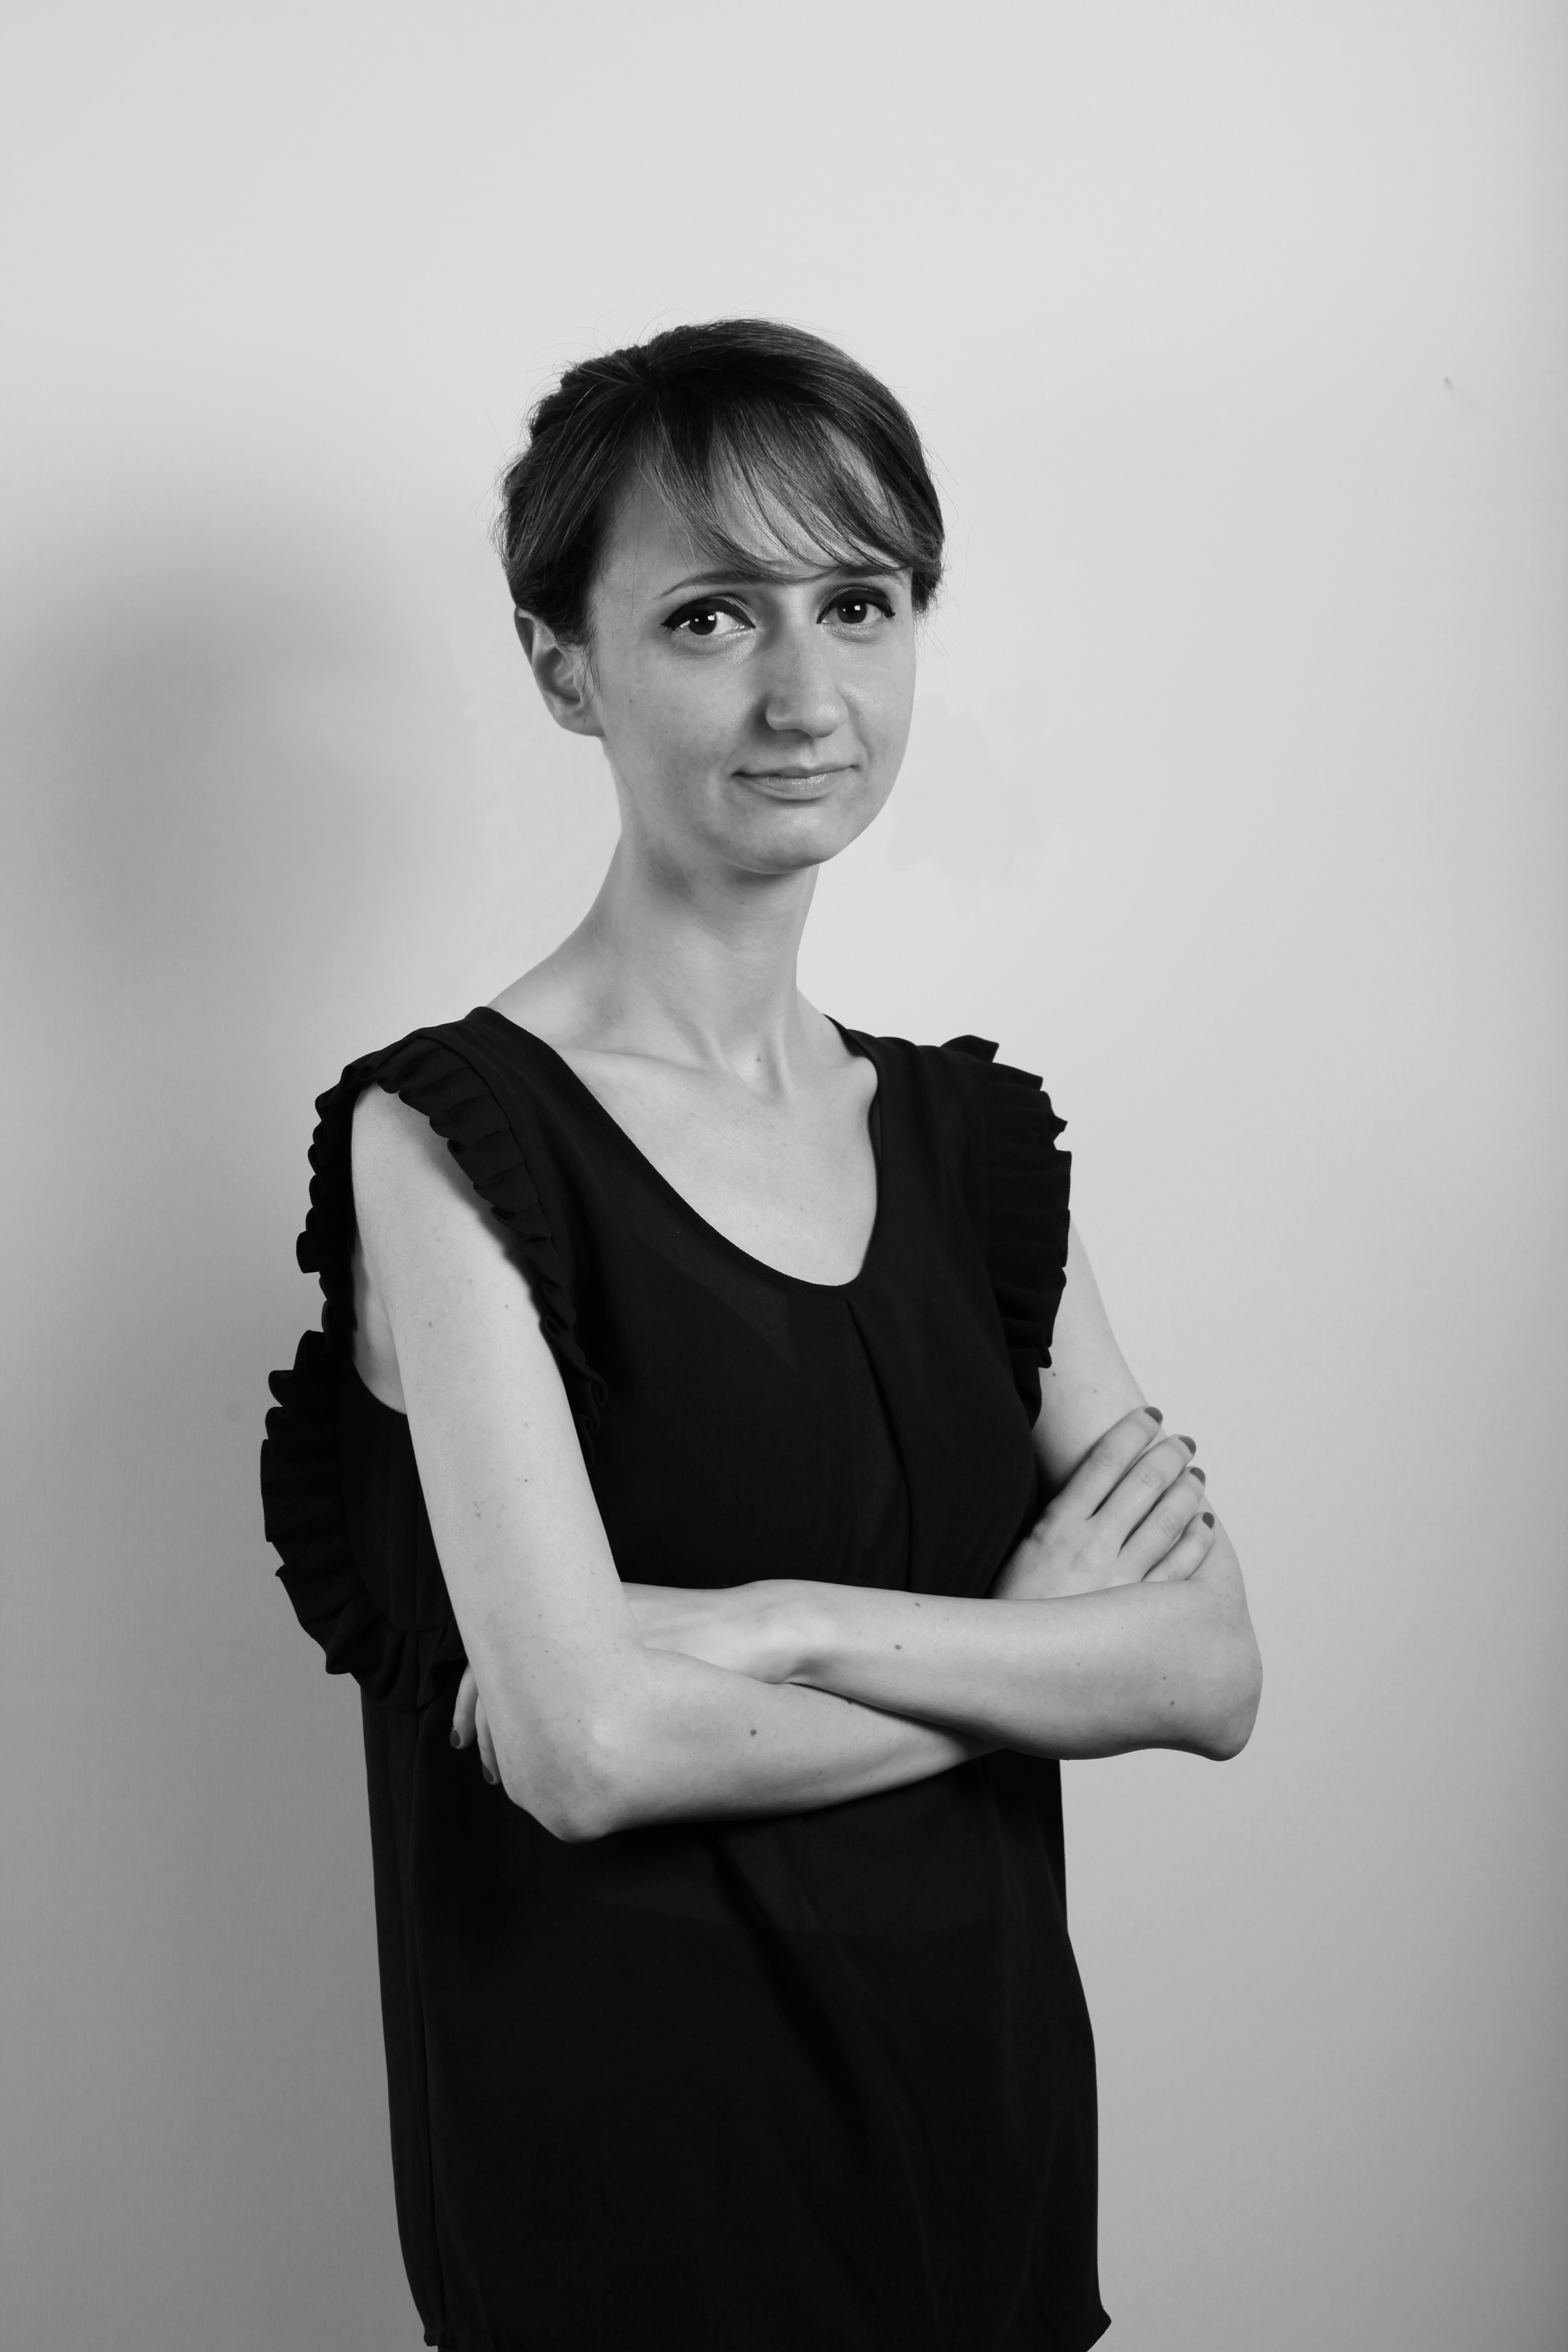 Linda Paoli